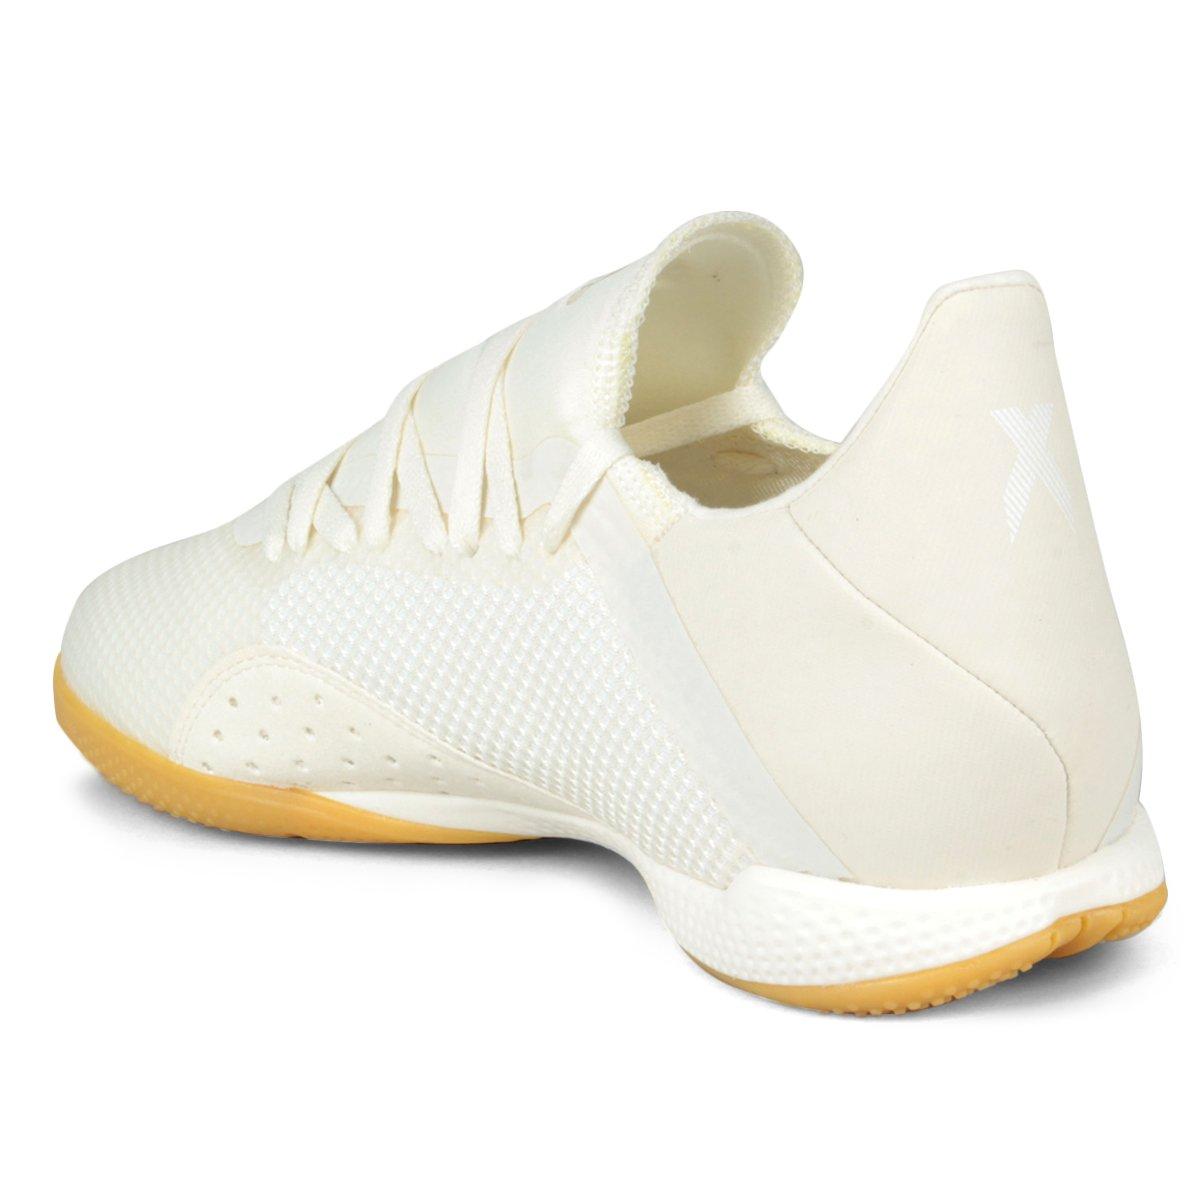 c9766ed916b6a Chuteira Futsal Adidas X Tango 18 3 IN - Tam: 44 - Shopping TudoAzul